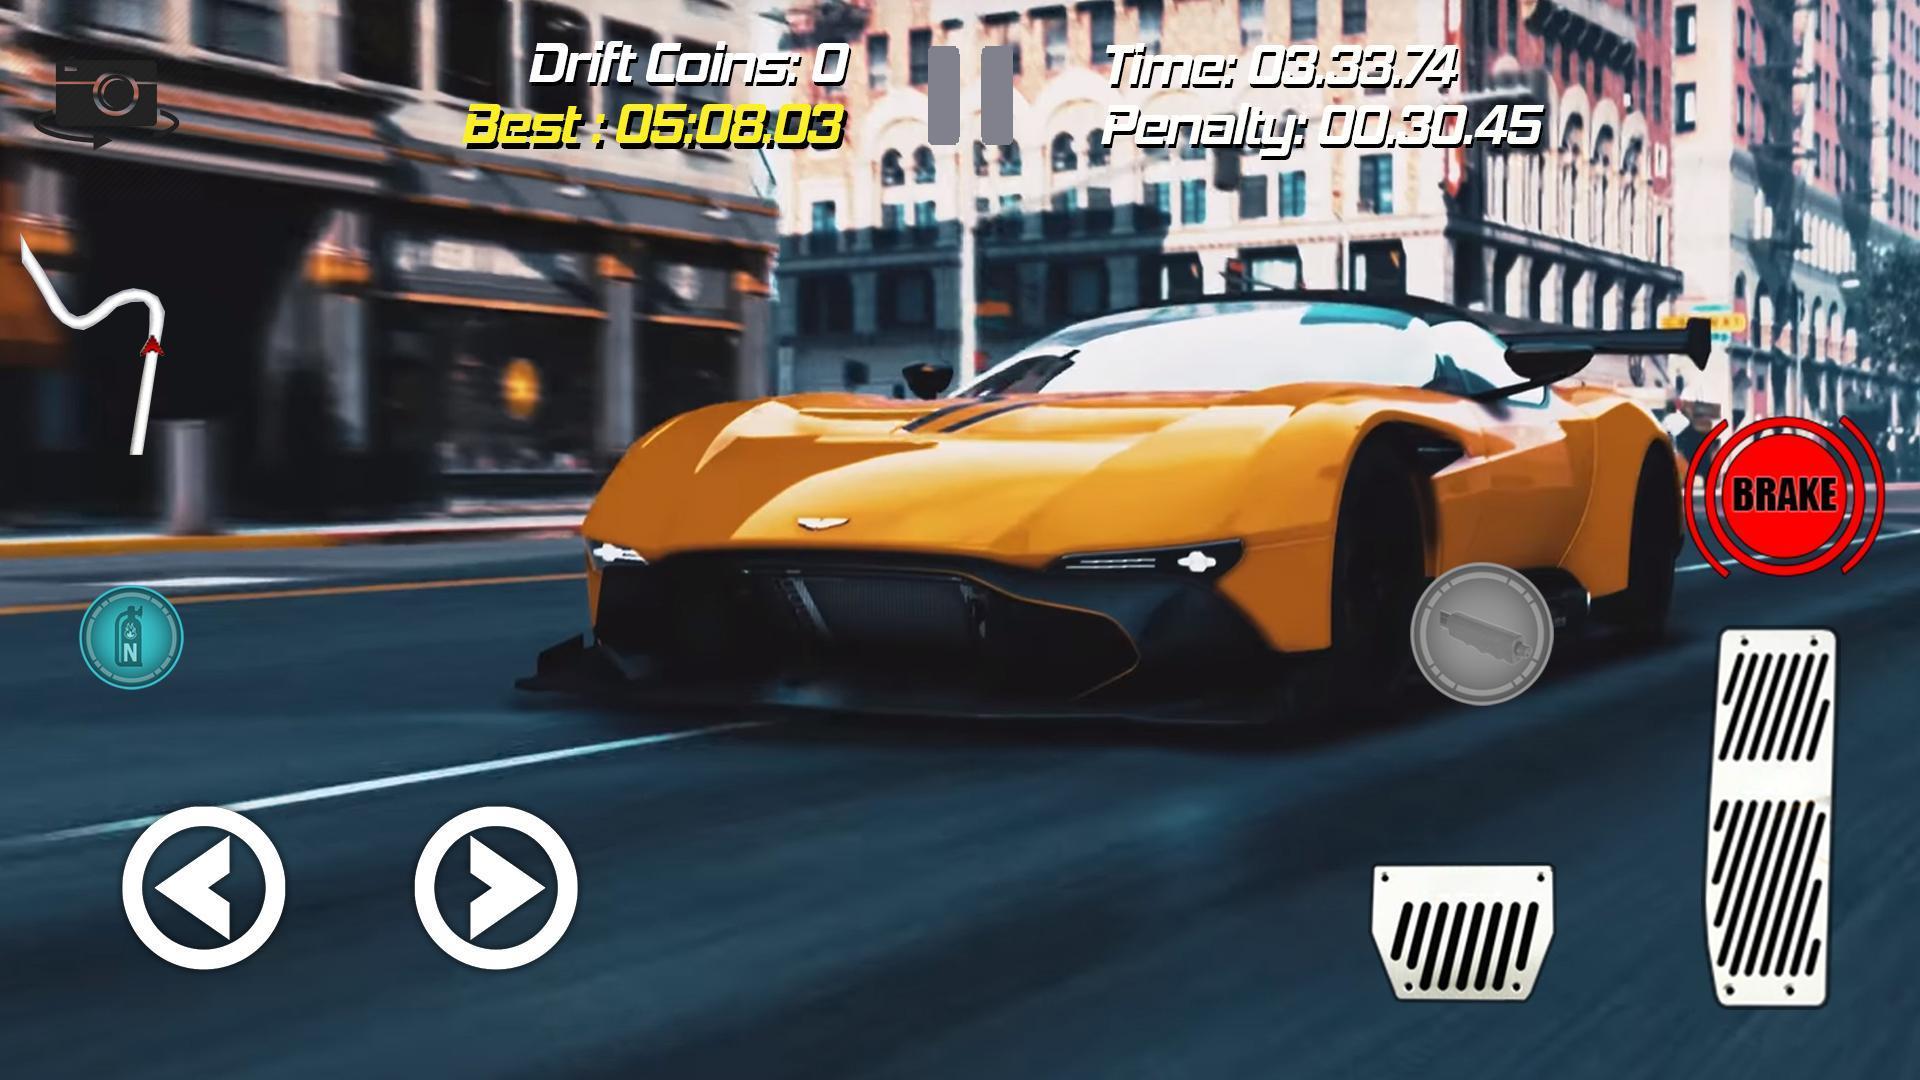 Drift Racing Aston Martin Vulcan Simulator Game For Android Apk Download